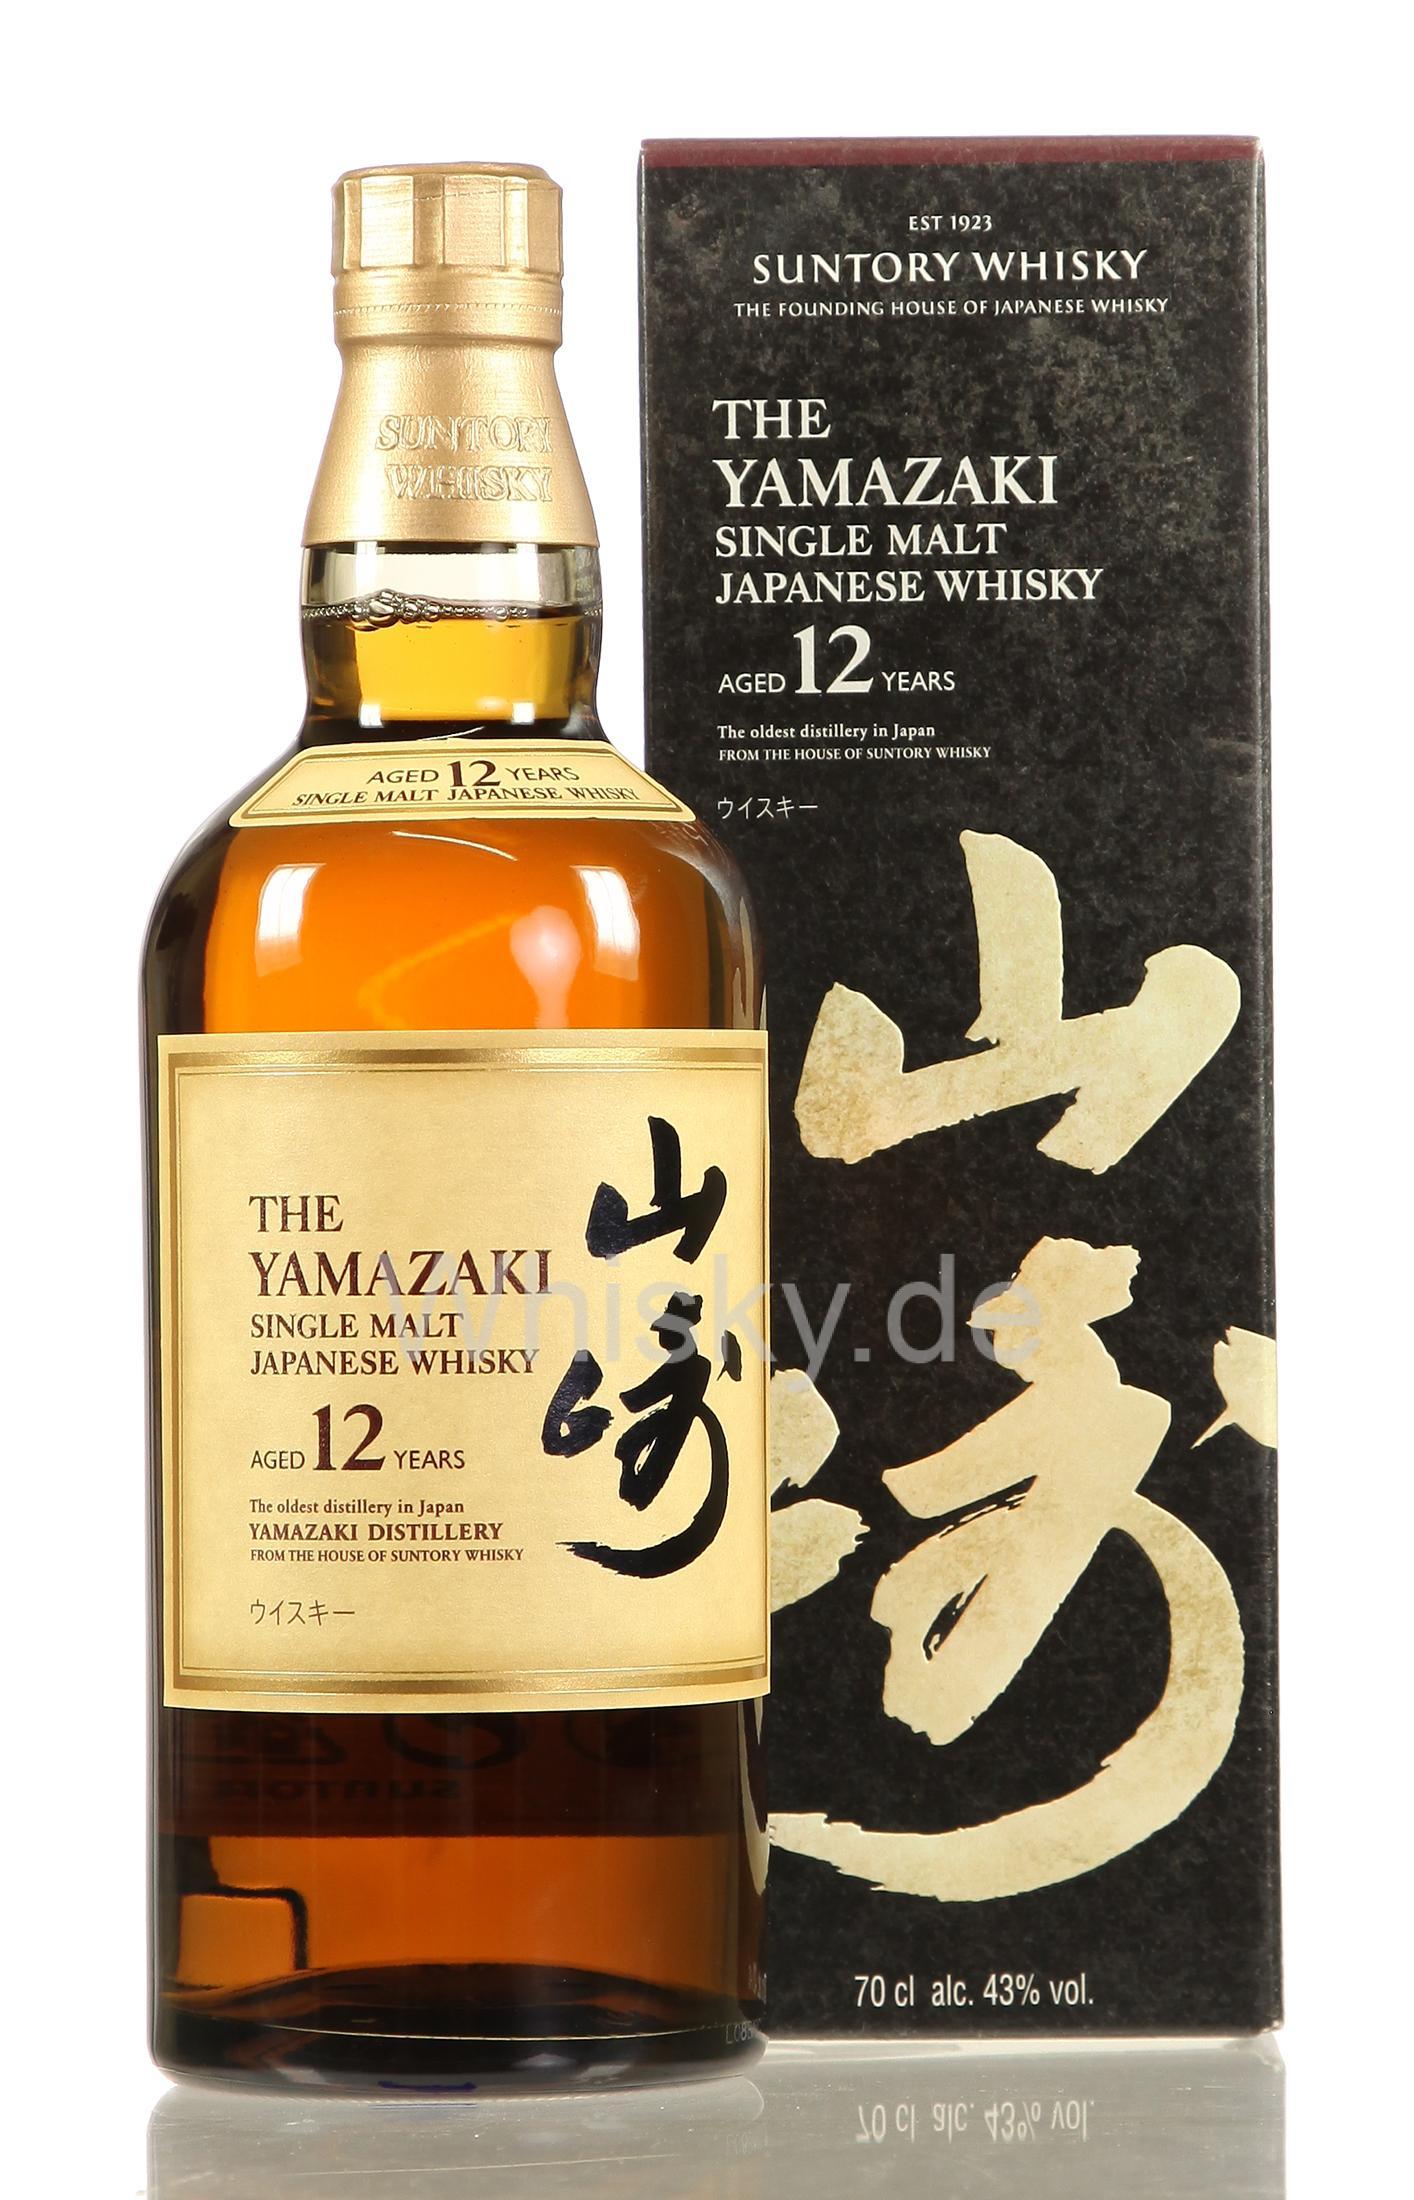 Suntory Yamazaki 12 Jahre 43% japanischer Whisky (Whisky.de) Whiskey